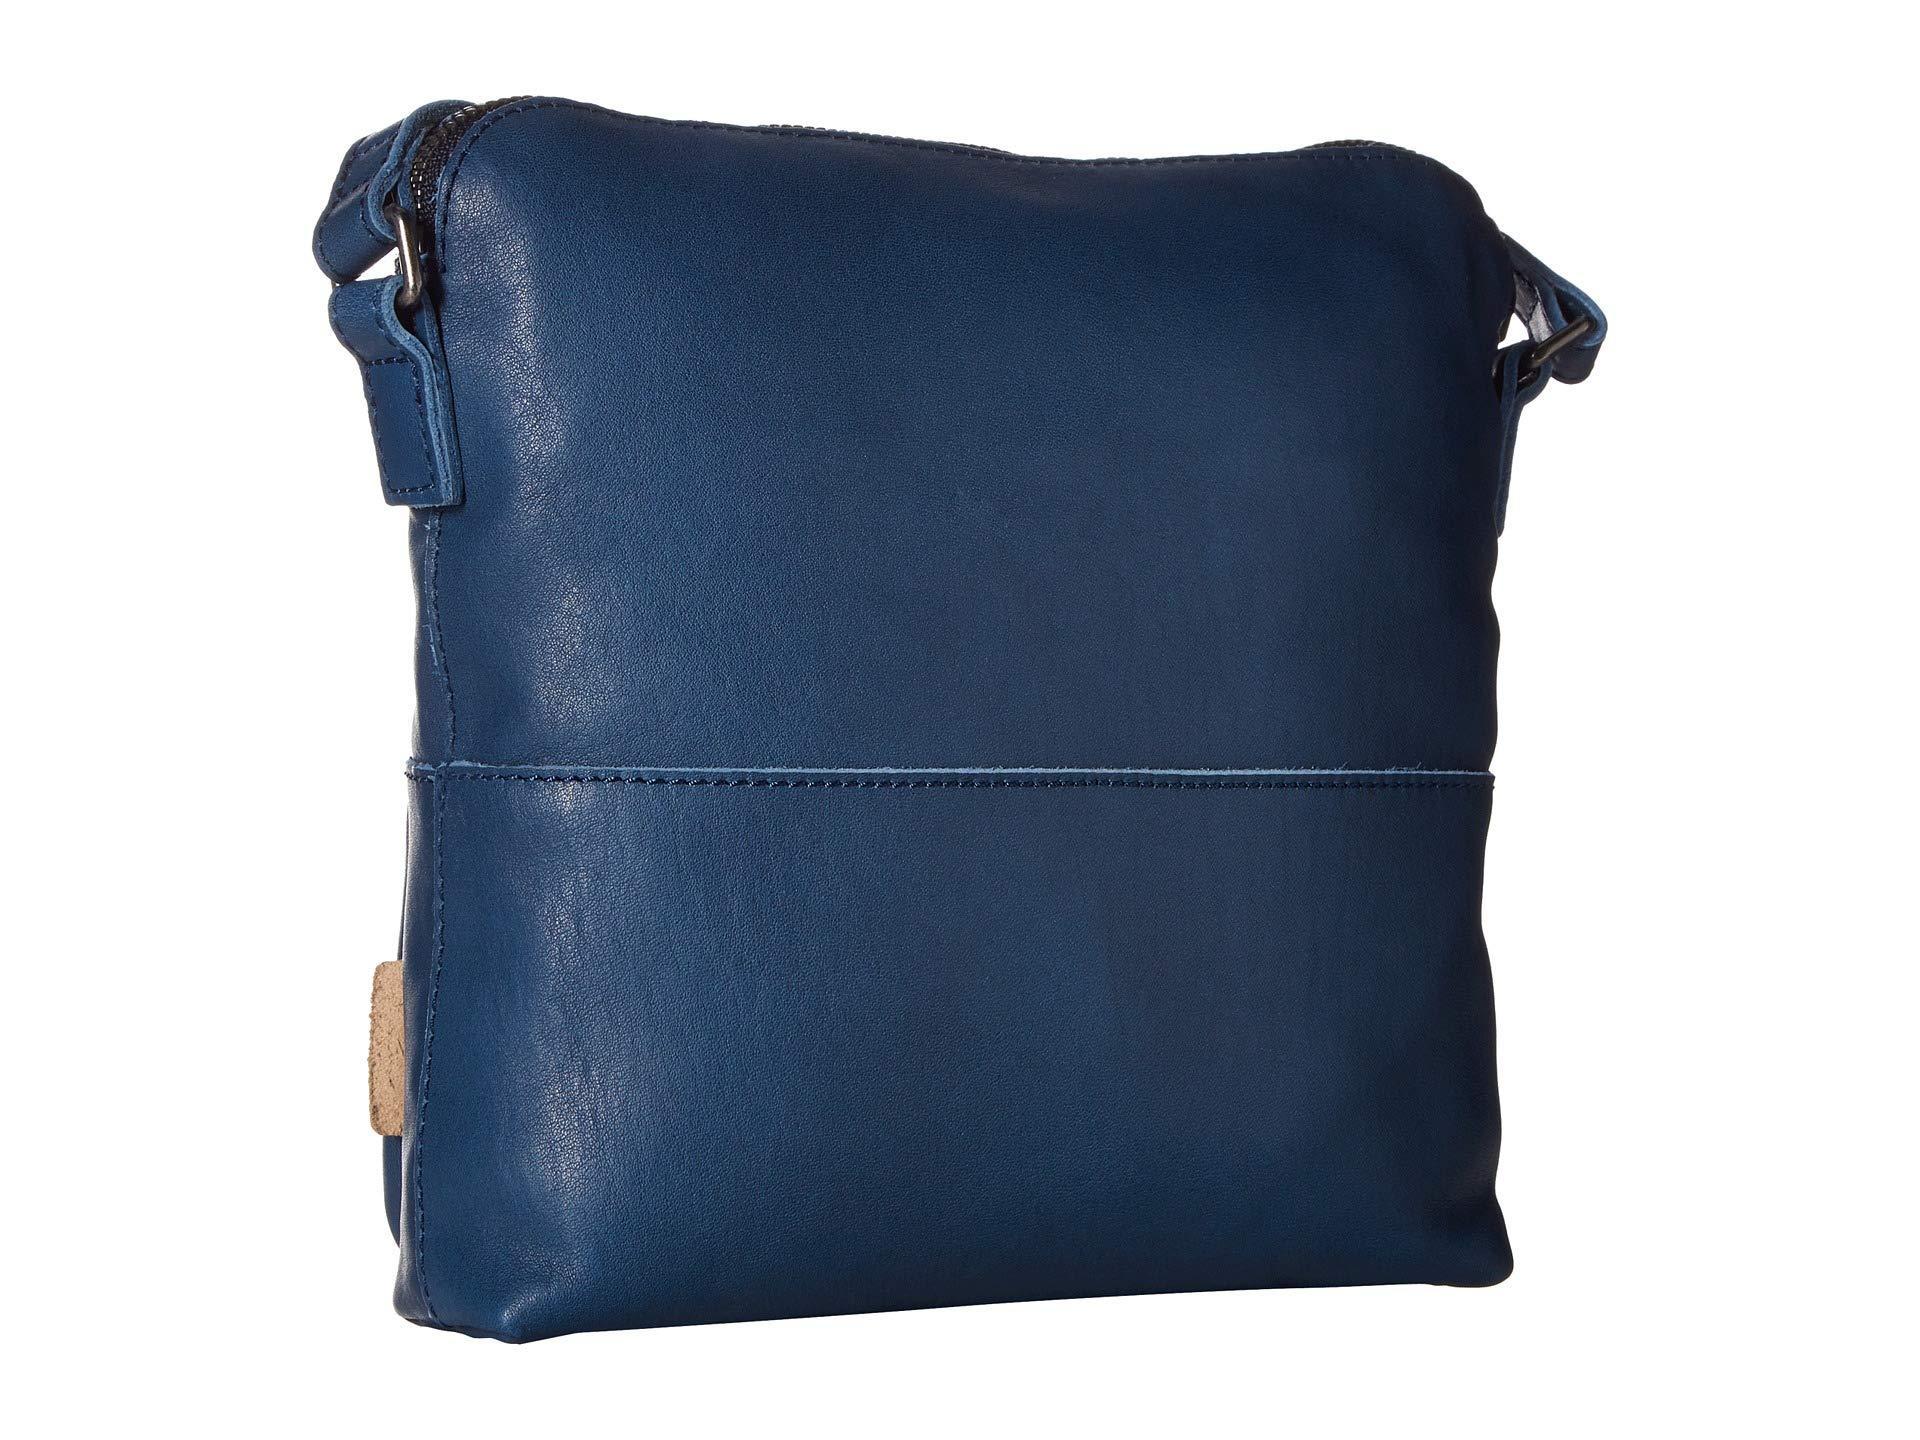 3ac0f3b94f79 Ecco - Casper Crossbody (retro Blue) Cross Body Handbags - Lyst. View  fullscreen